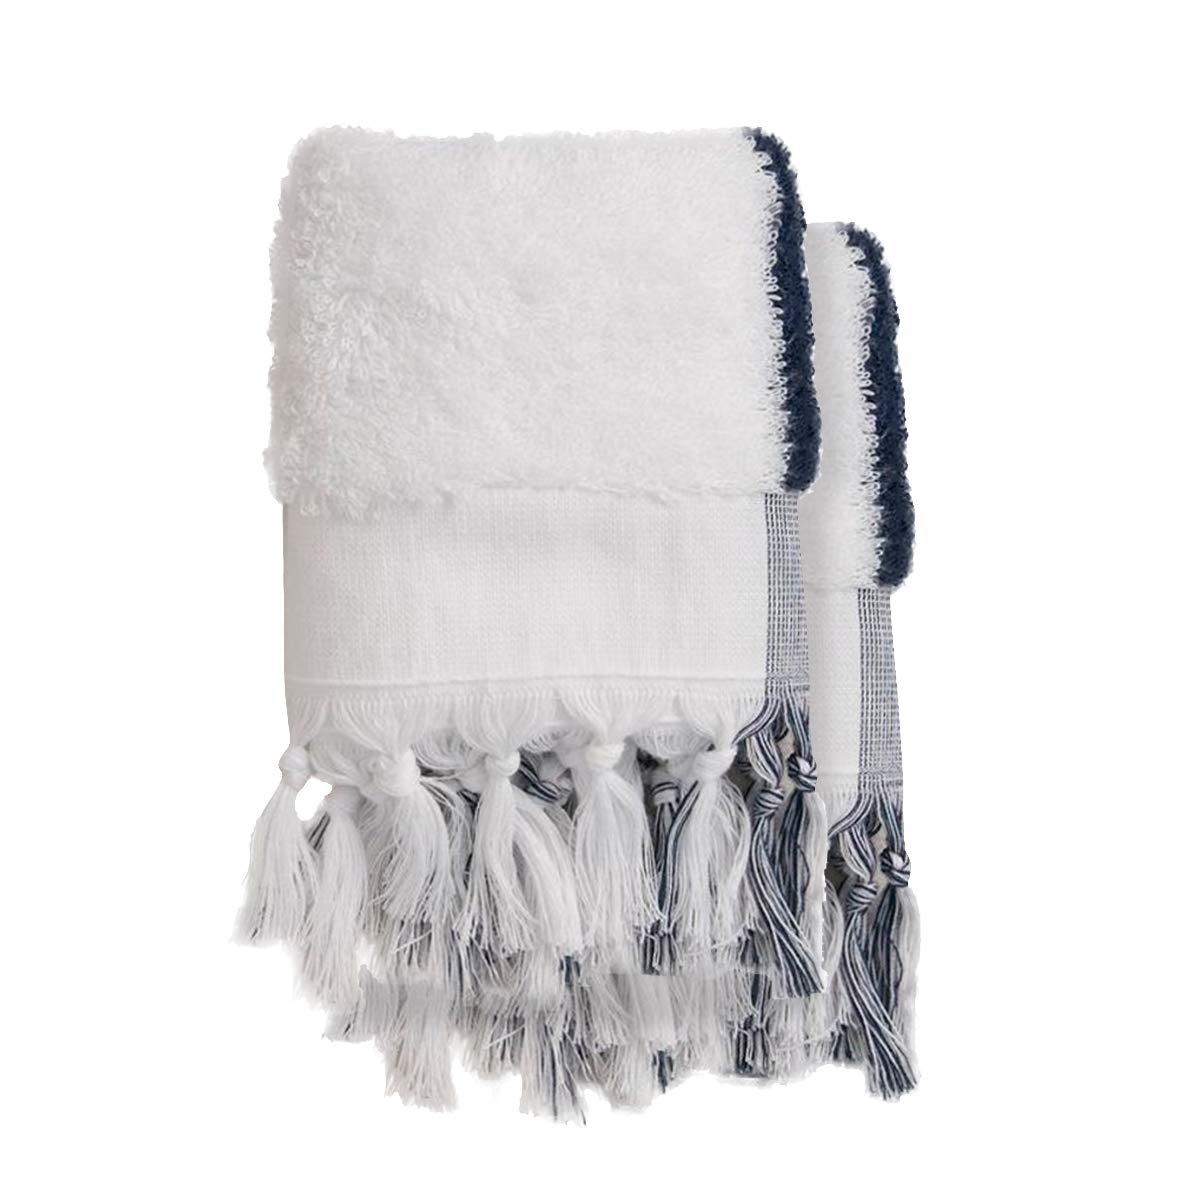 Chakra Matt Bamboo Organic Oversize Hand Towel, Set of 2, 19''x35'' Stripe Pattern Turkish Extra Large Hand Towels- Multipurpose Use for Bath, Hand, Face, Gym, Yatch and Spa - Oeko-TEX